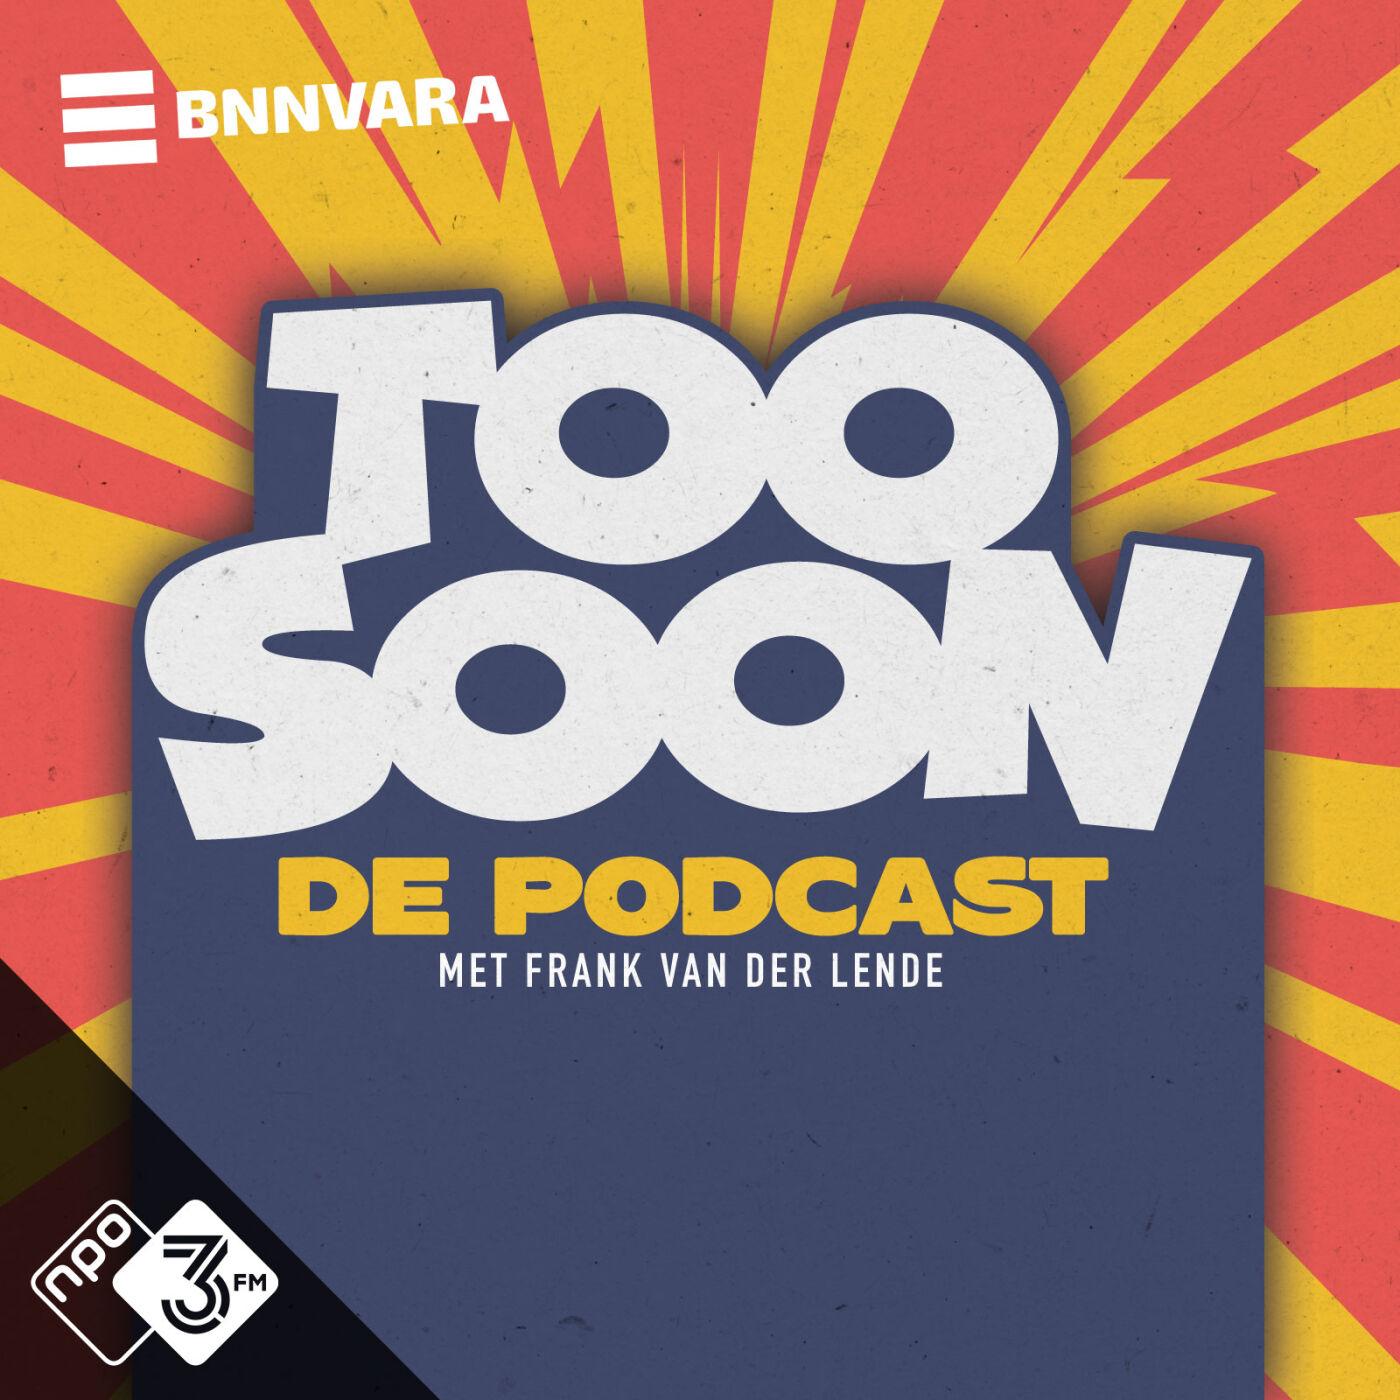 Too Soon de Podcast logo